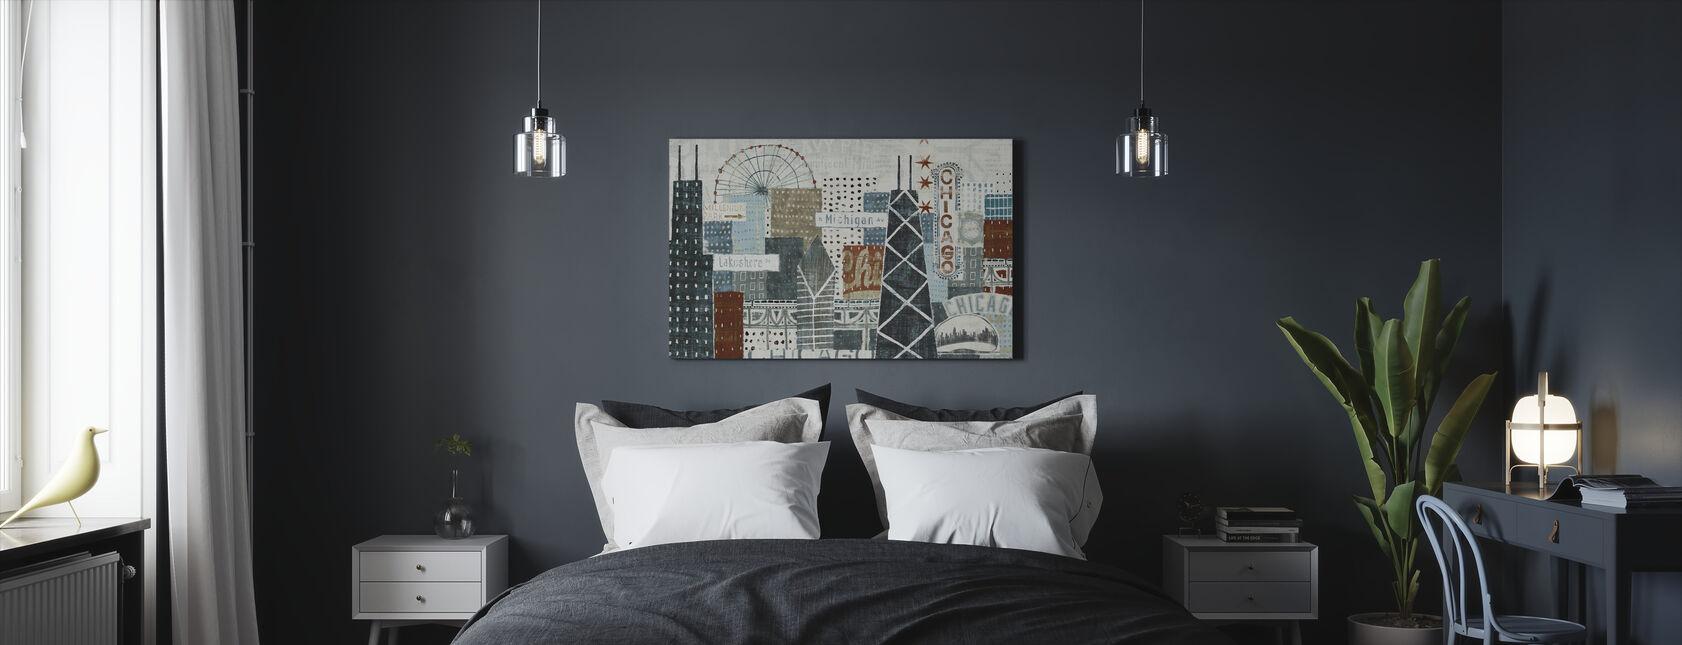 Hey Chicago - Canvas print - Bedroom